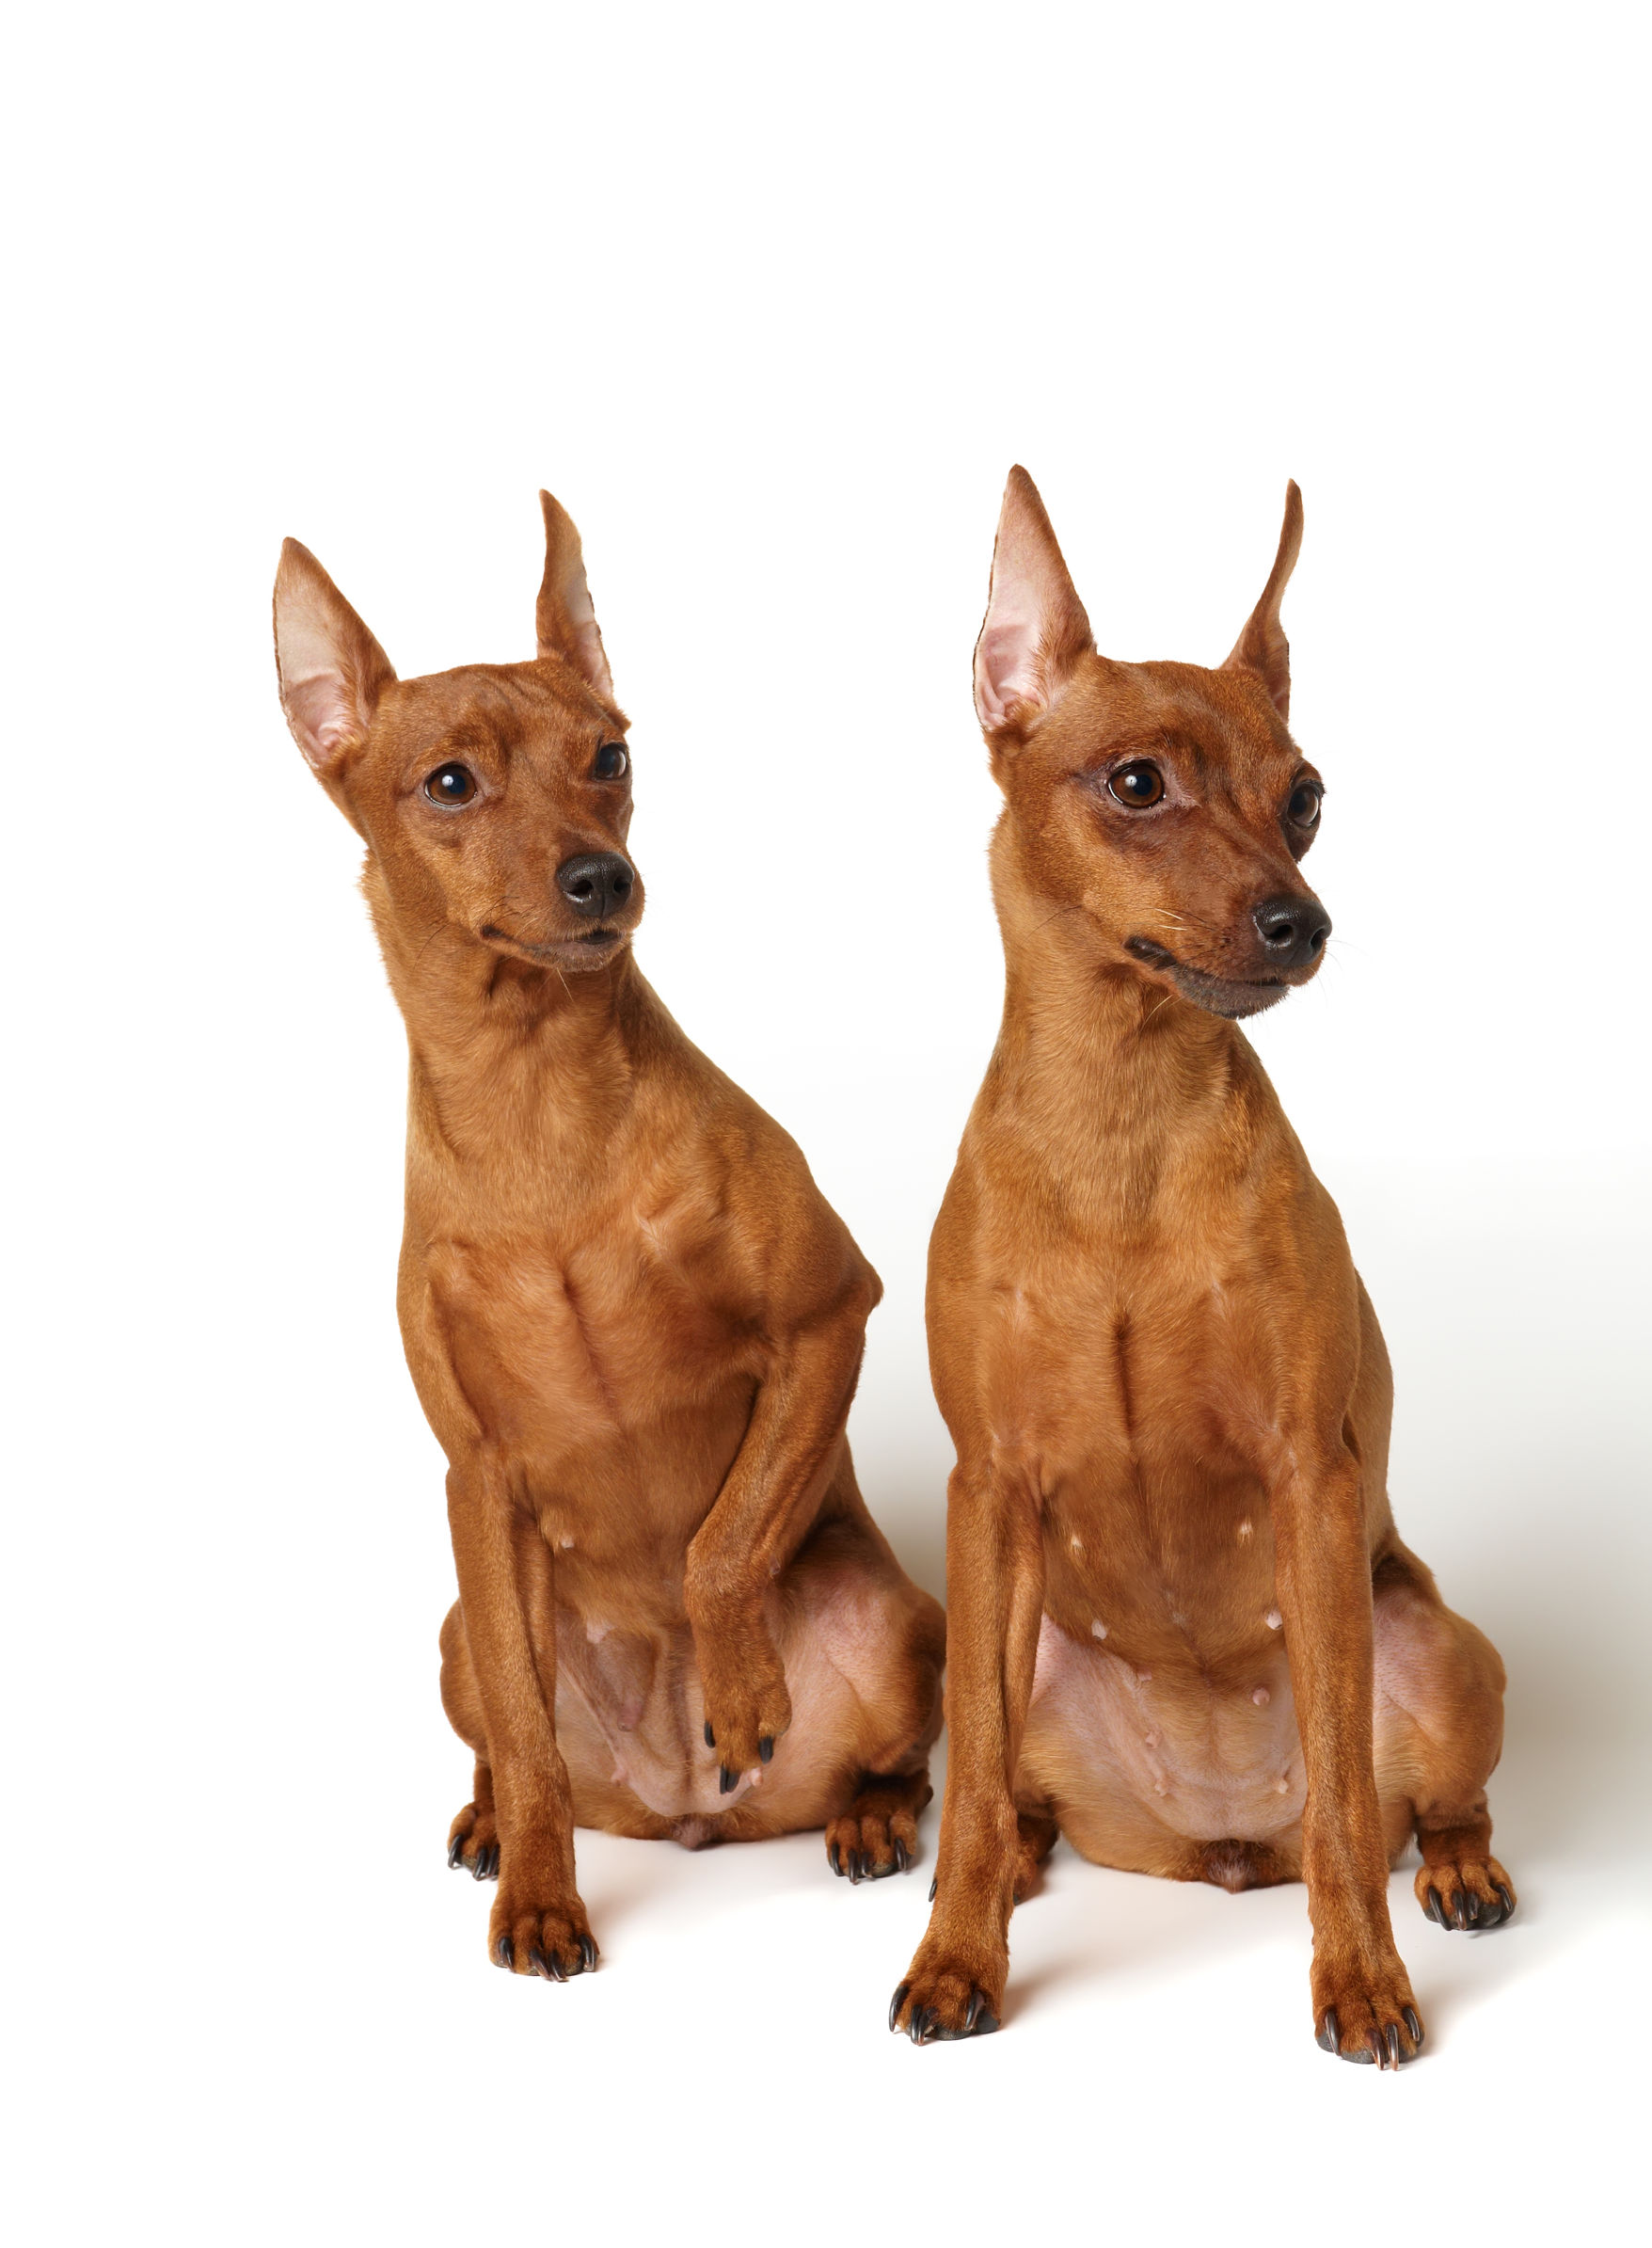 Red Dog Breeds The Smart Dog Guide